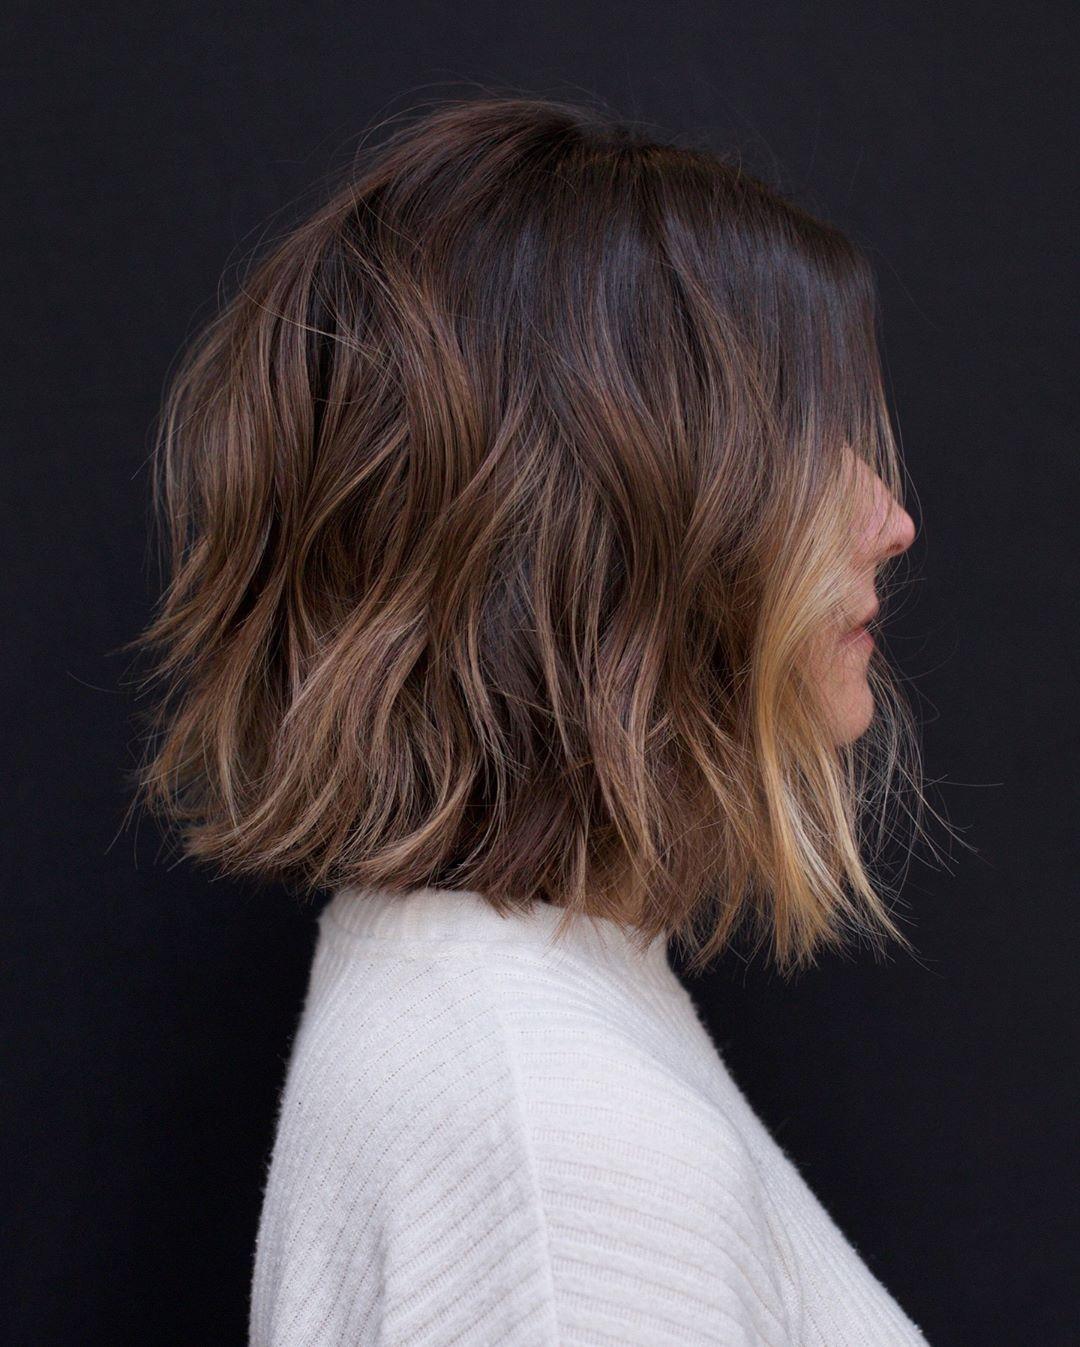 10 Casual Medium Bob Hair Cuts - Female Bob Hairstyles 2020